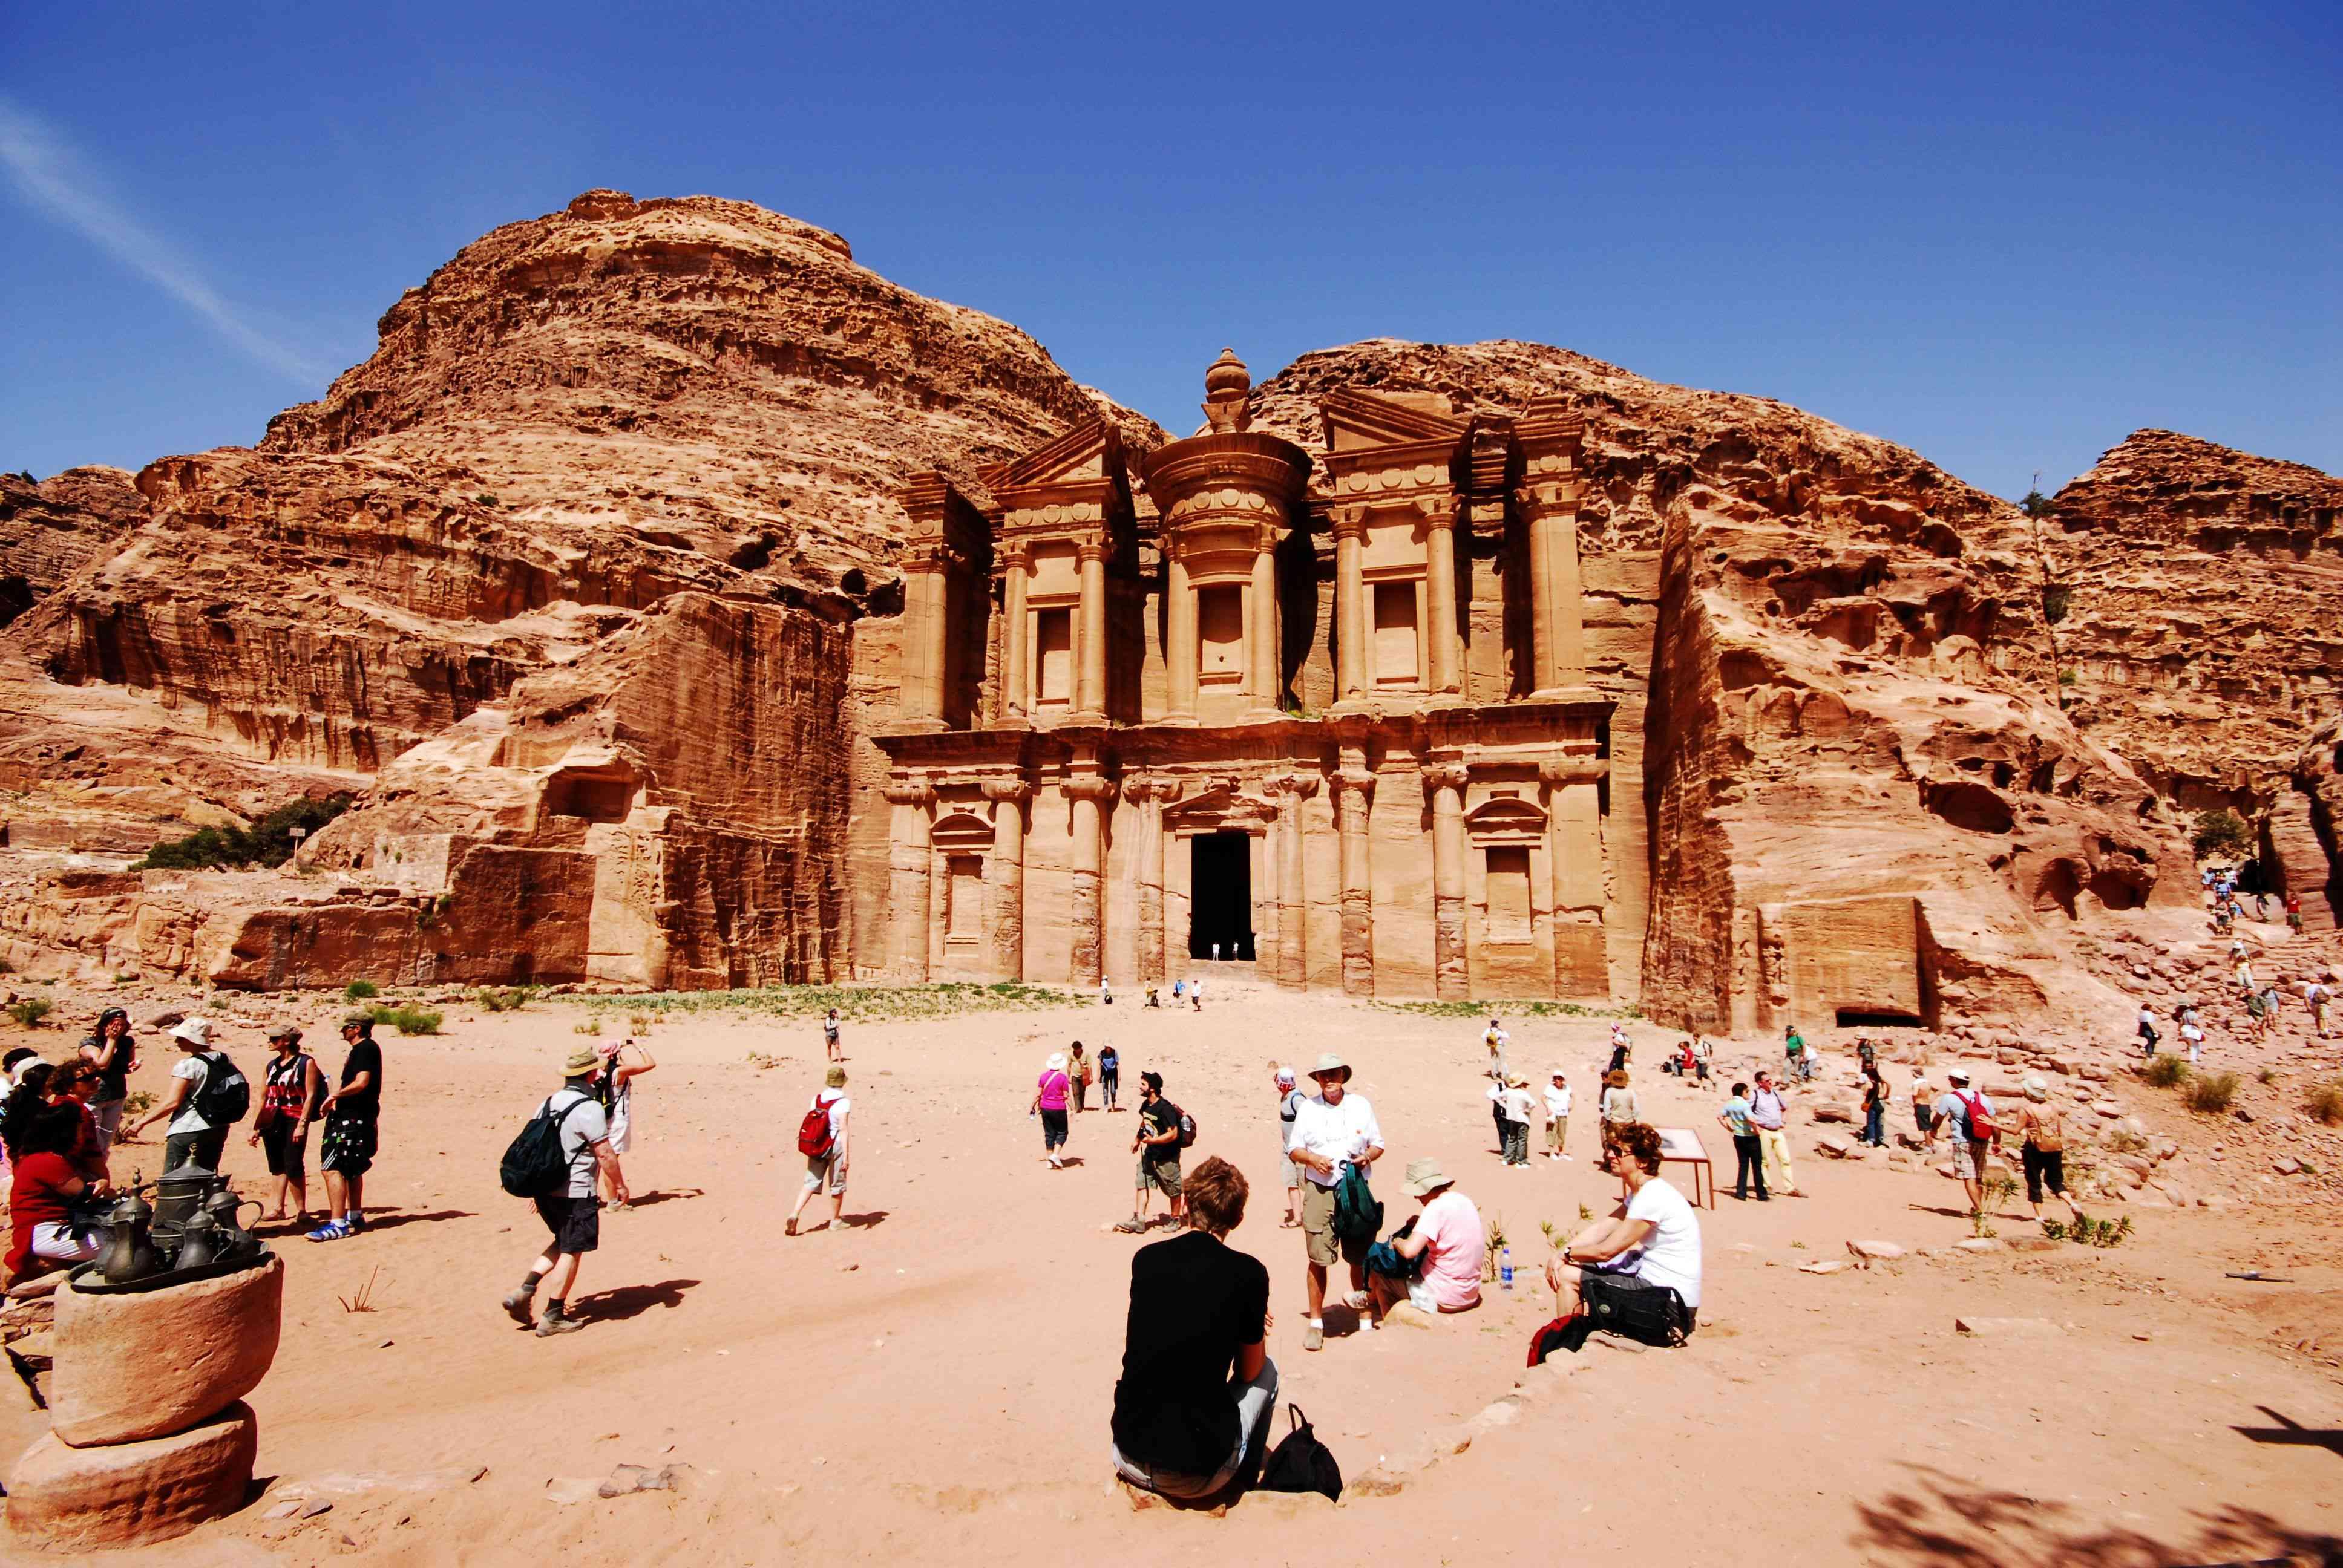 Main site of Petra